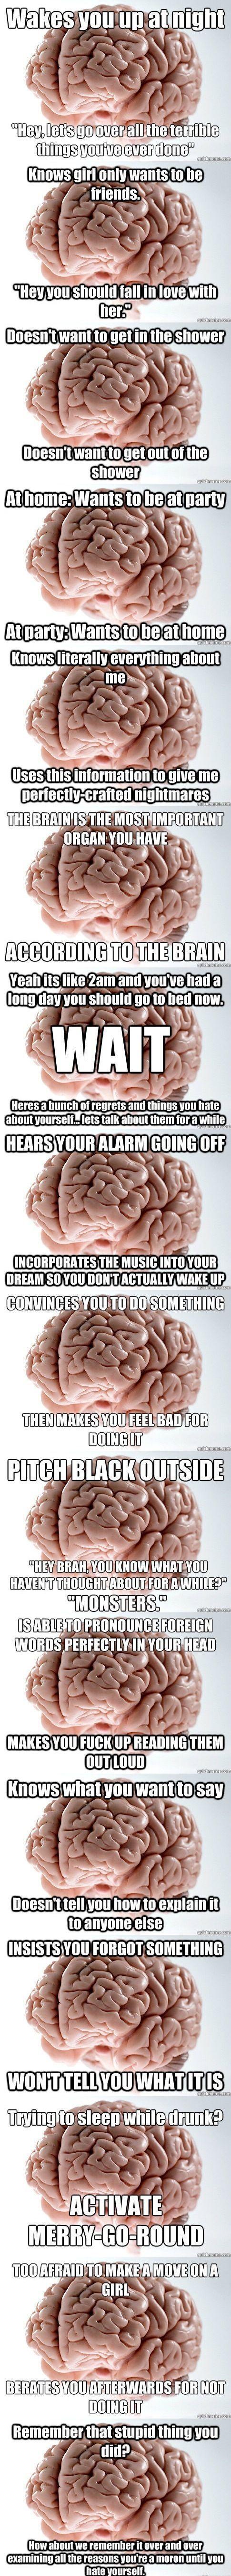 scumbag brain memes